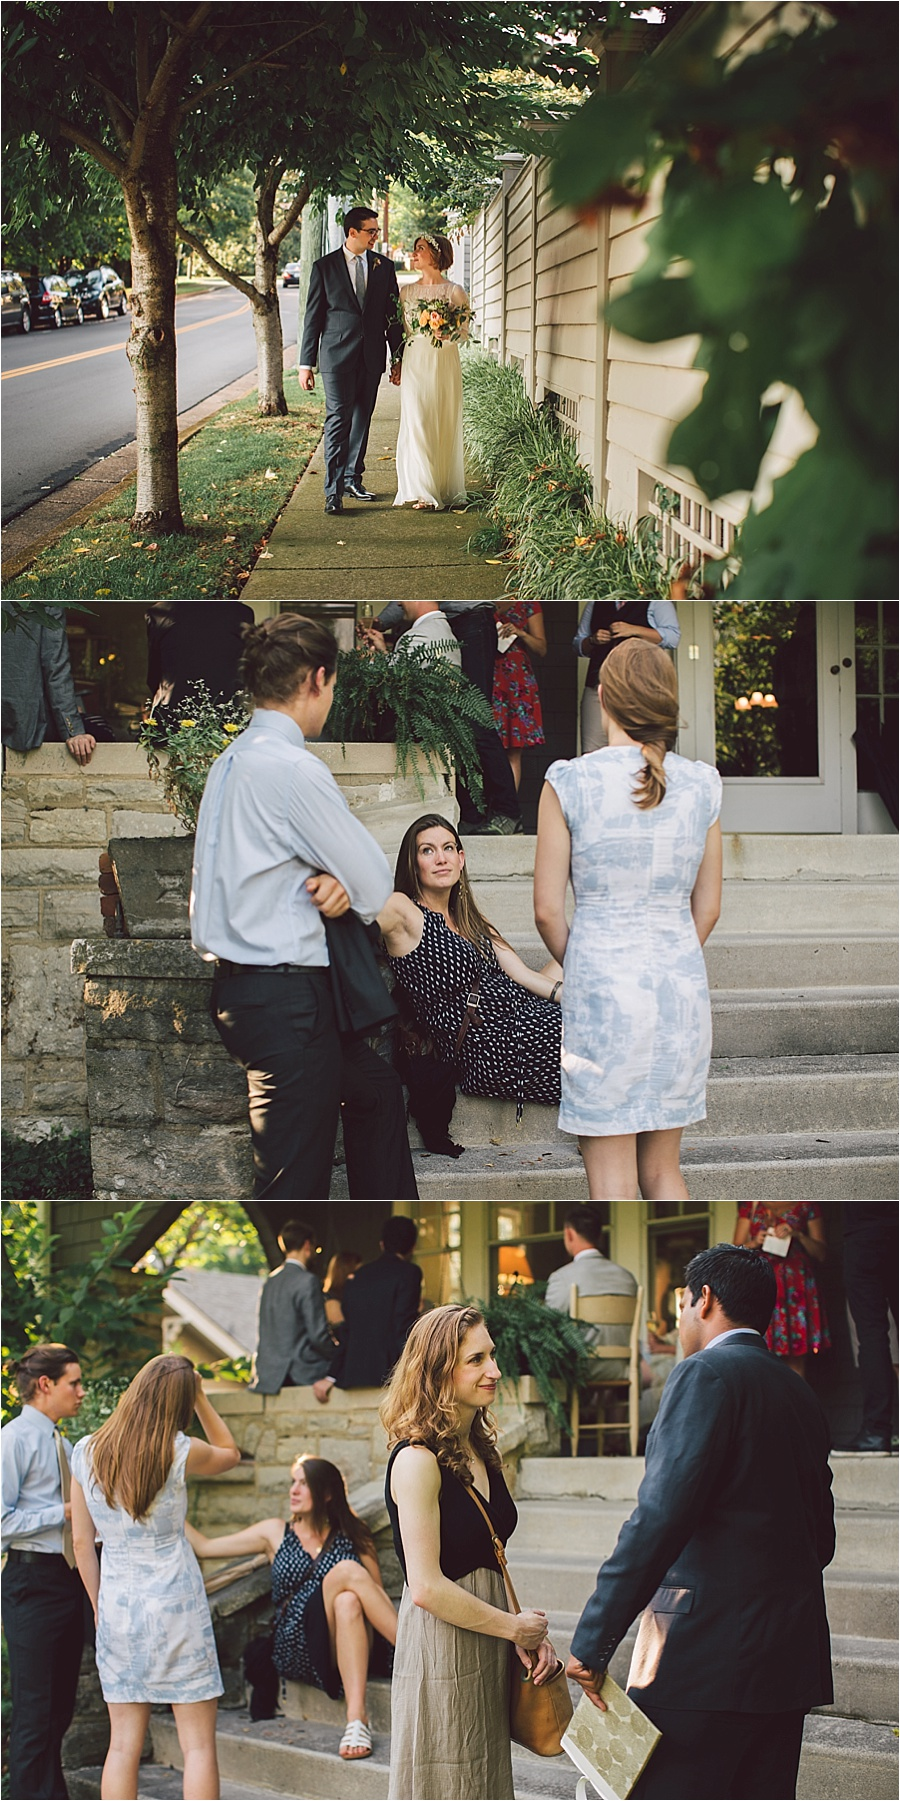 CK-Photo-Nashville-Wedding-Photographer-b_0095.jpg